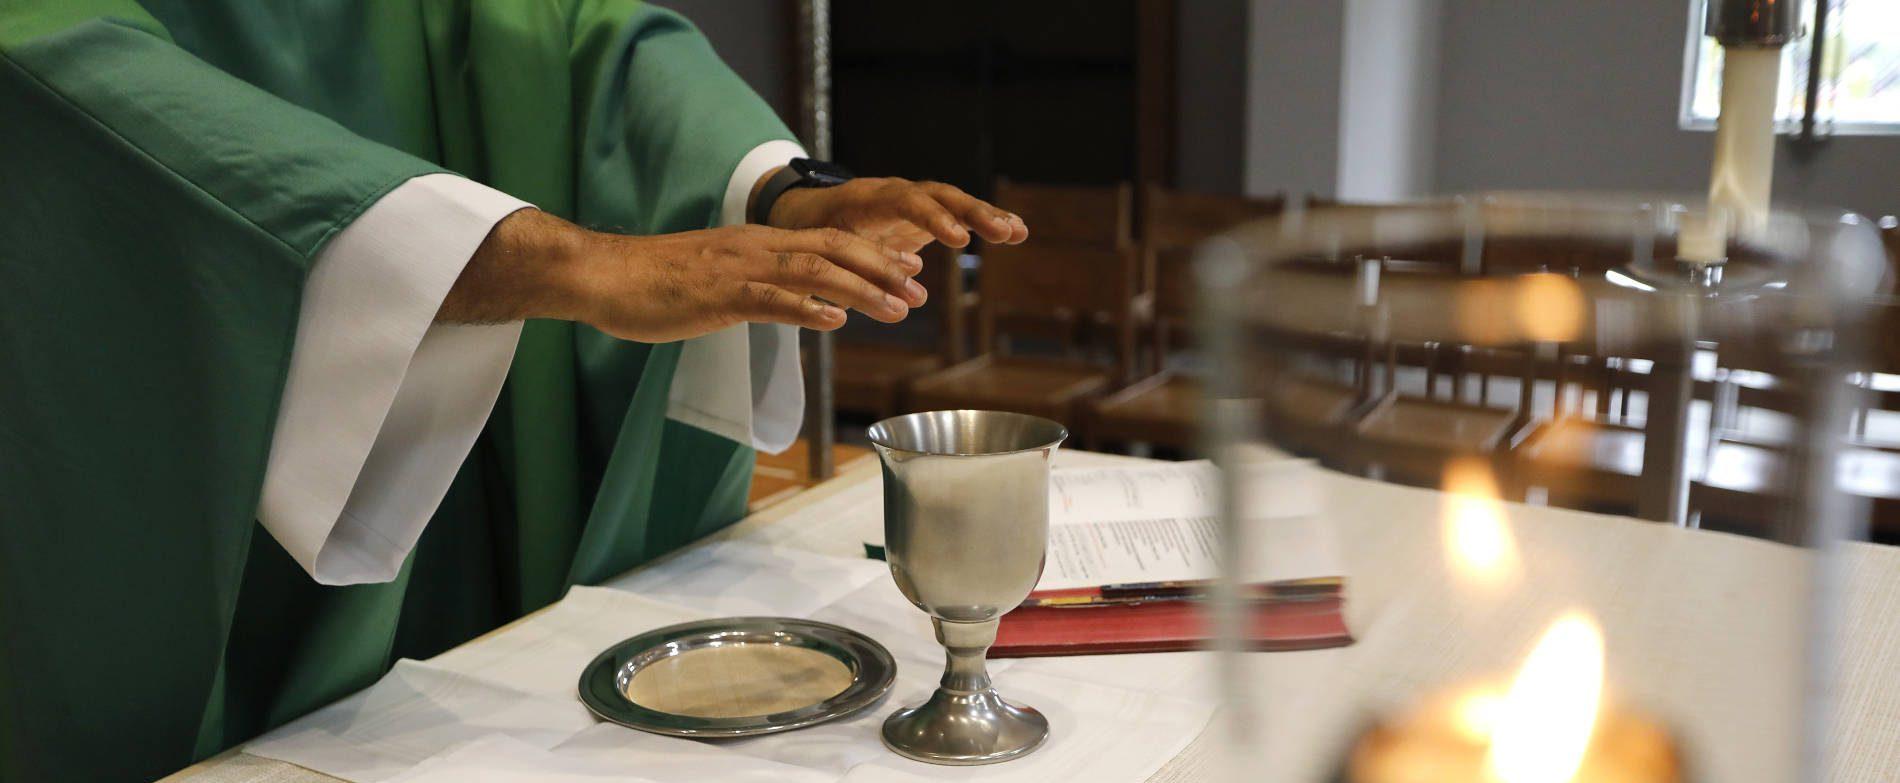 The Eucharist InitiativeSept. 11 – Oct. 24